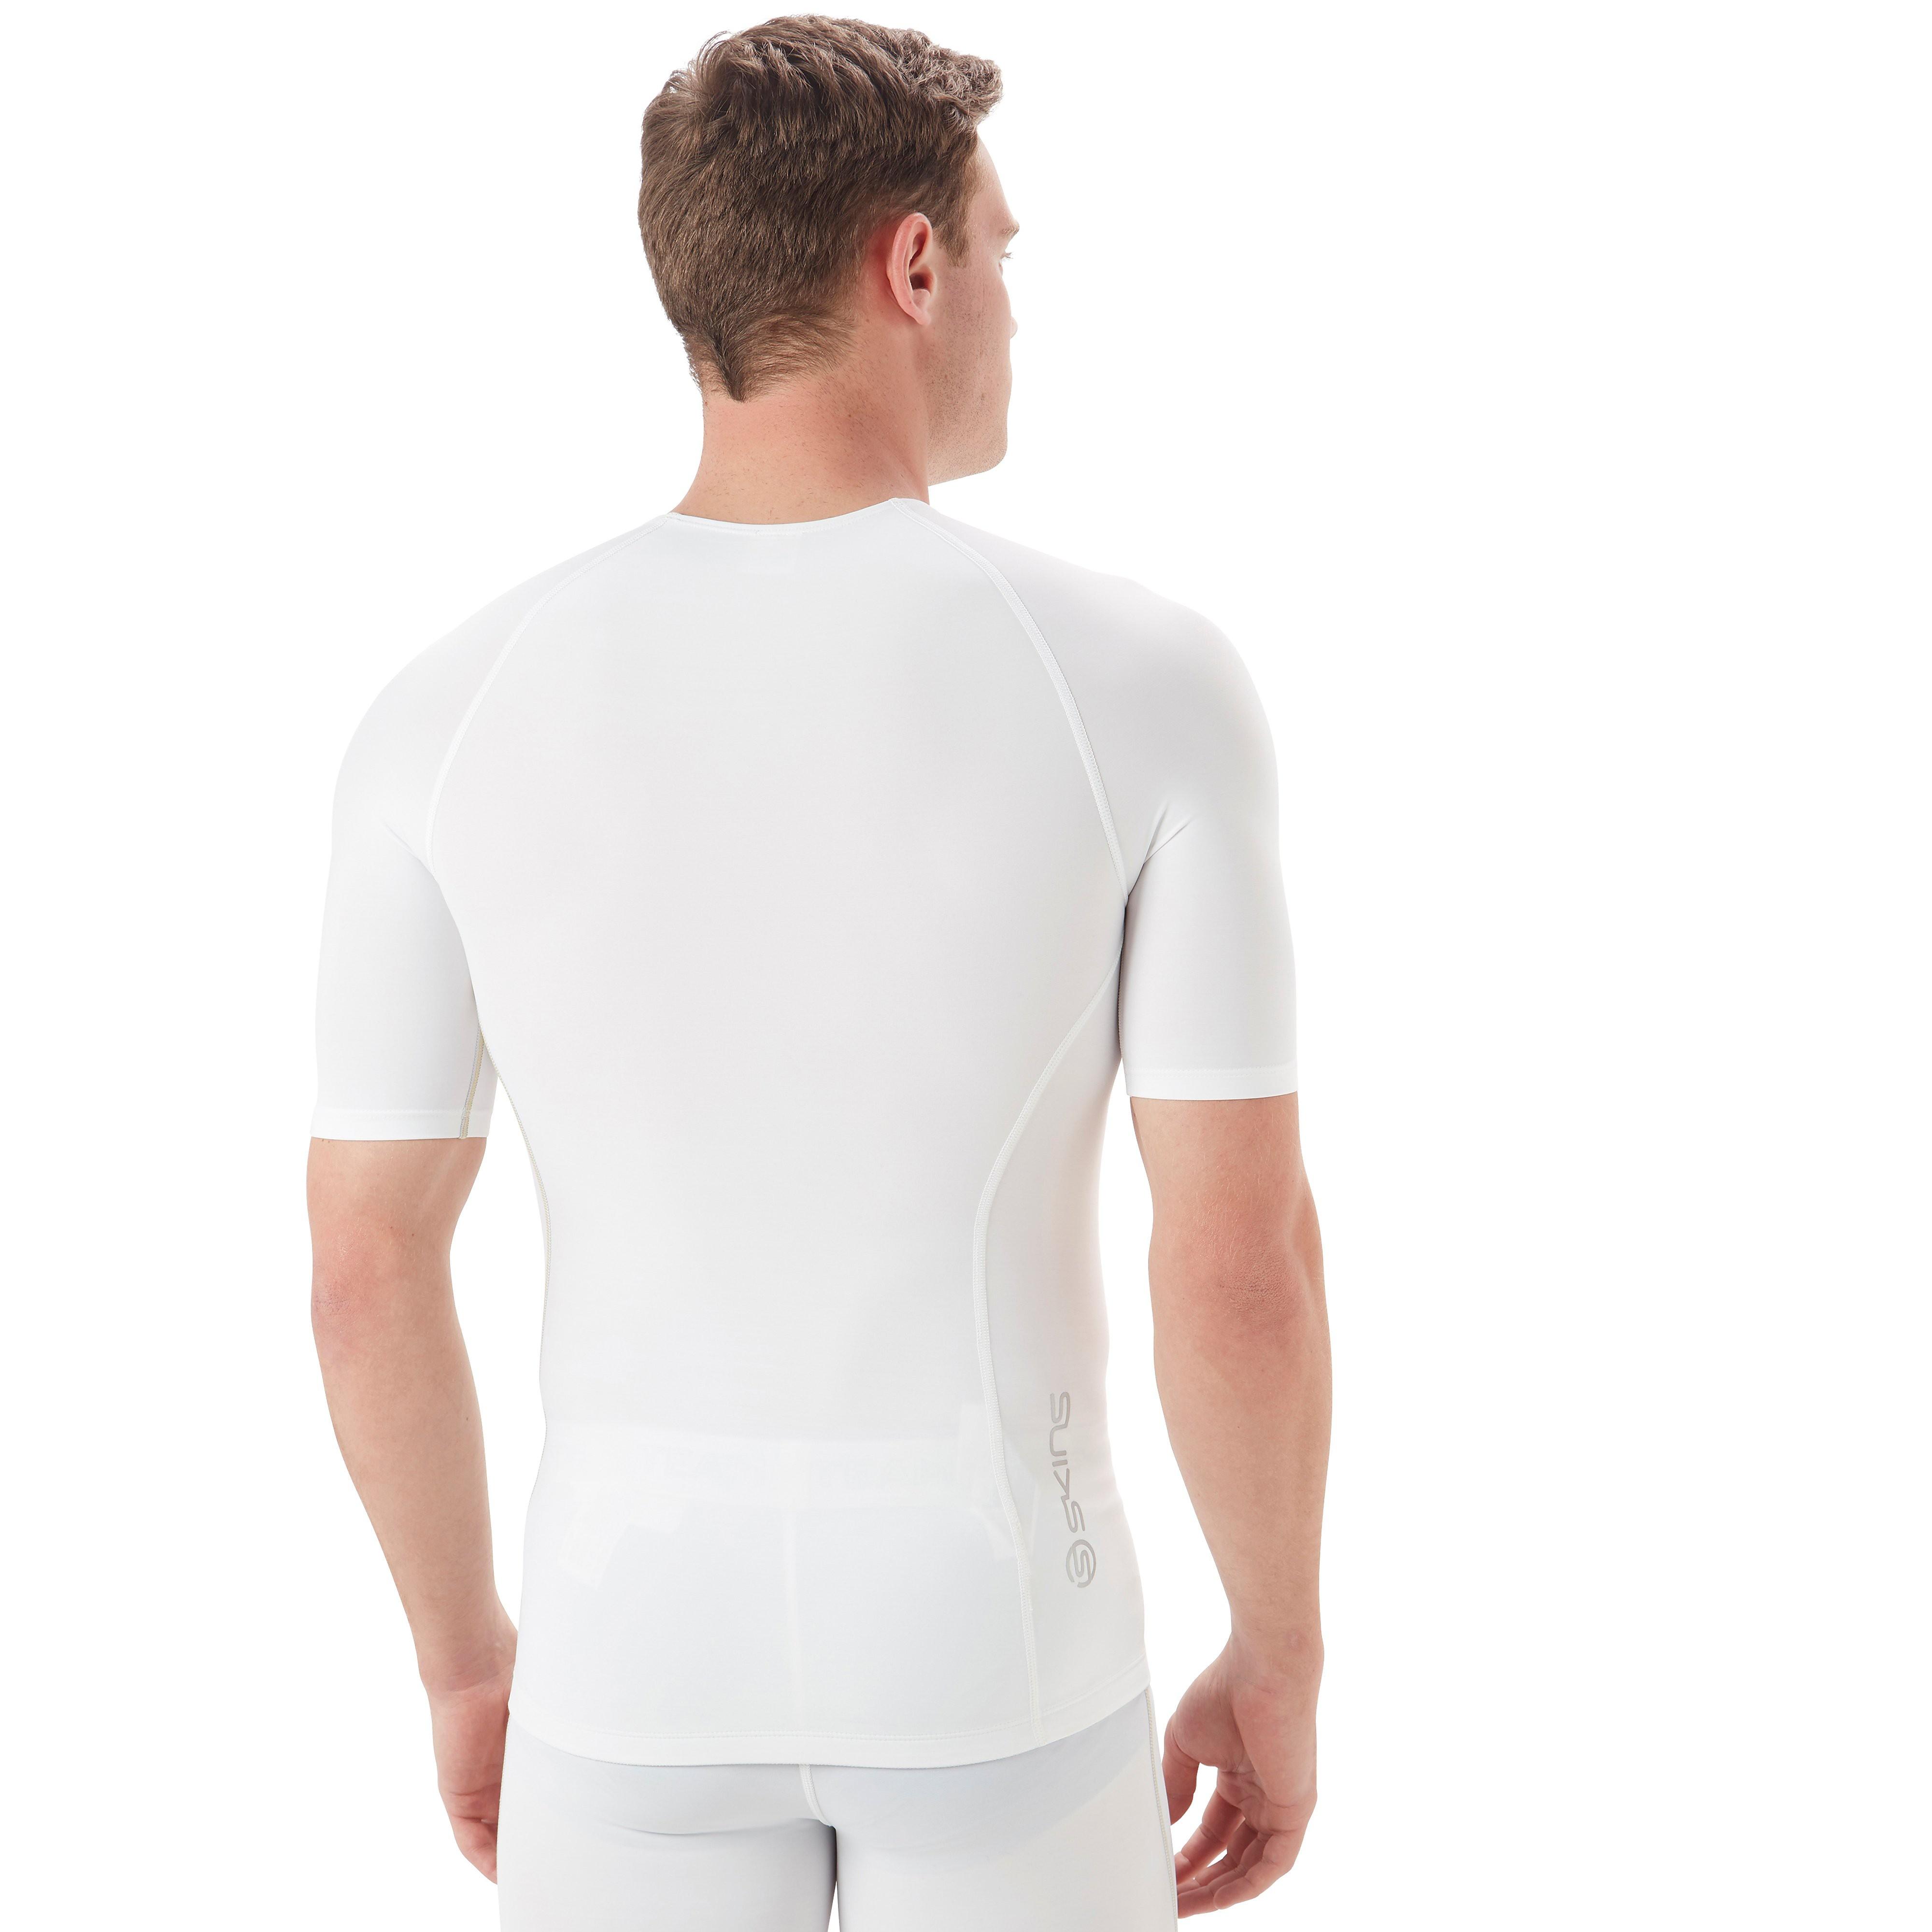 Skins DNAmic Team Short Sleeve Base Layer Men's Training Top